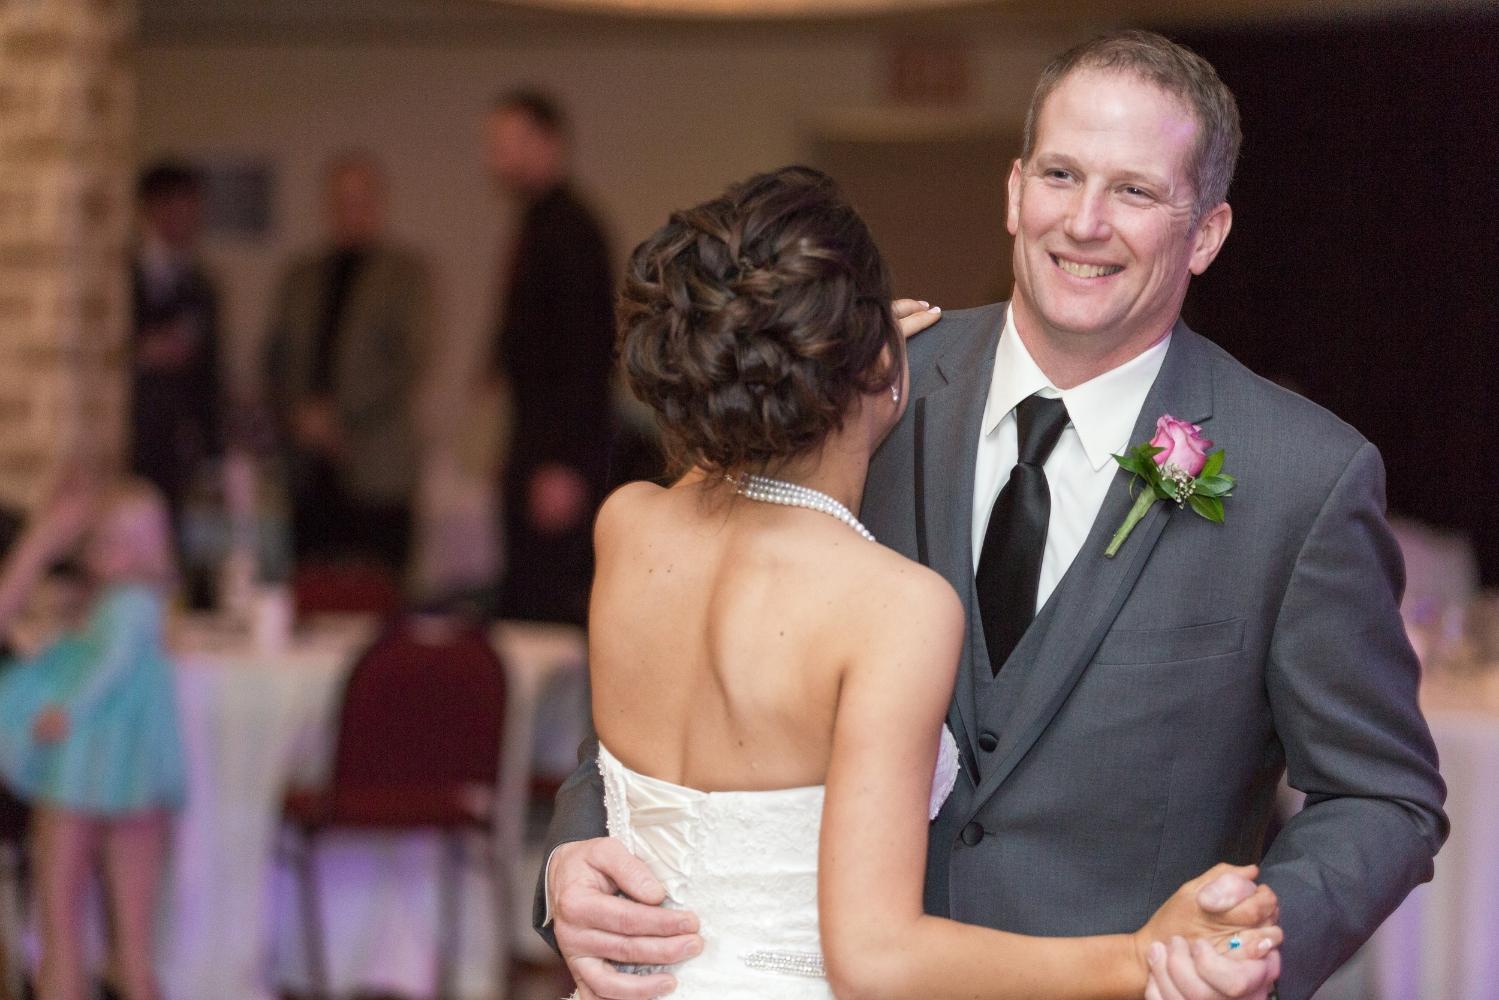 #fatherdaughterdance #mnwedding #winterwedding